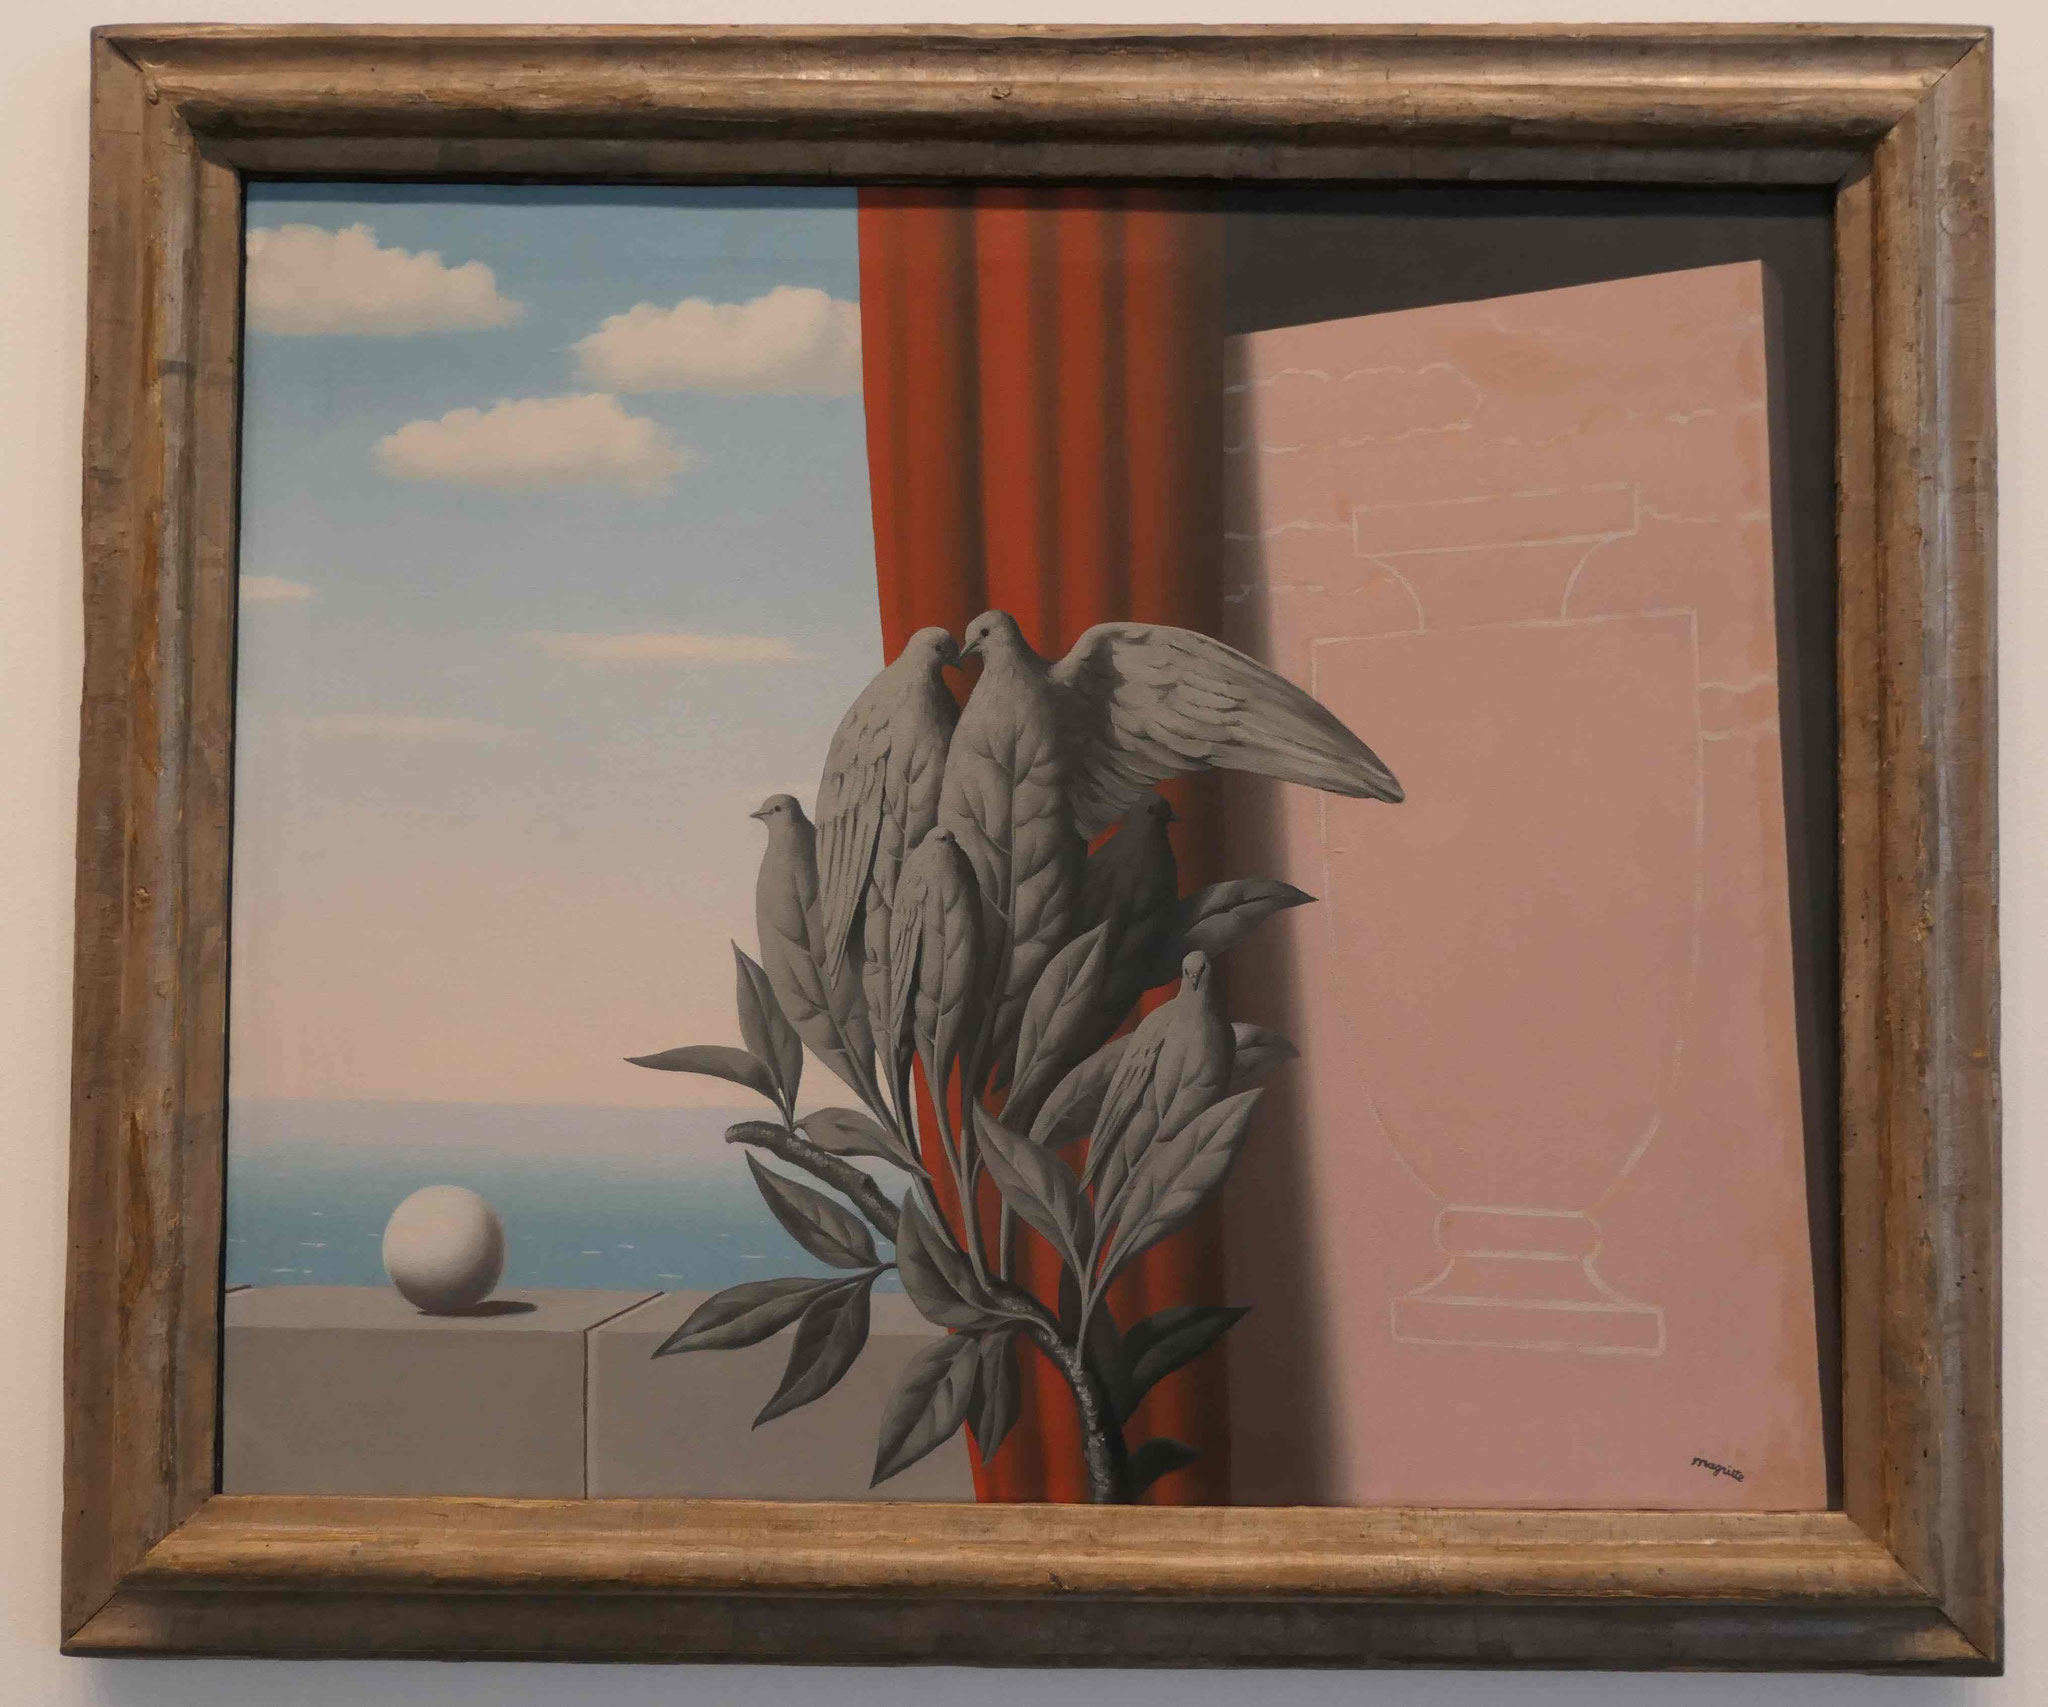 René Margrit, Der Äquator, 1942, Neue Nationalgalerie Berlin